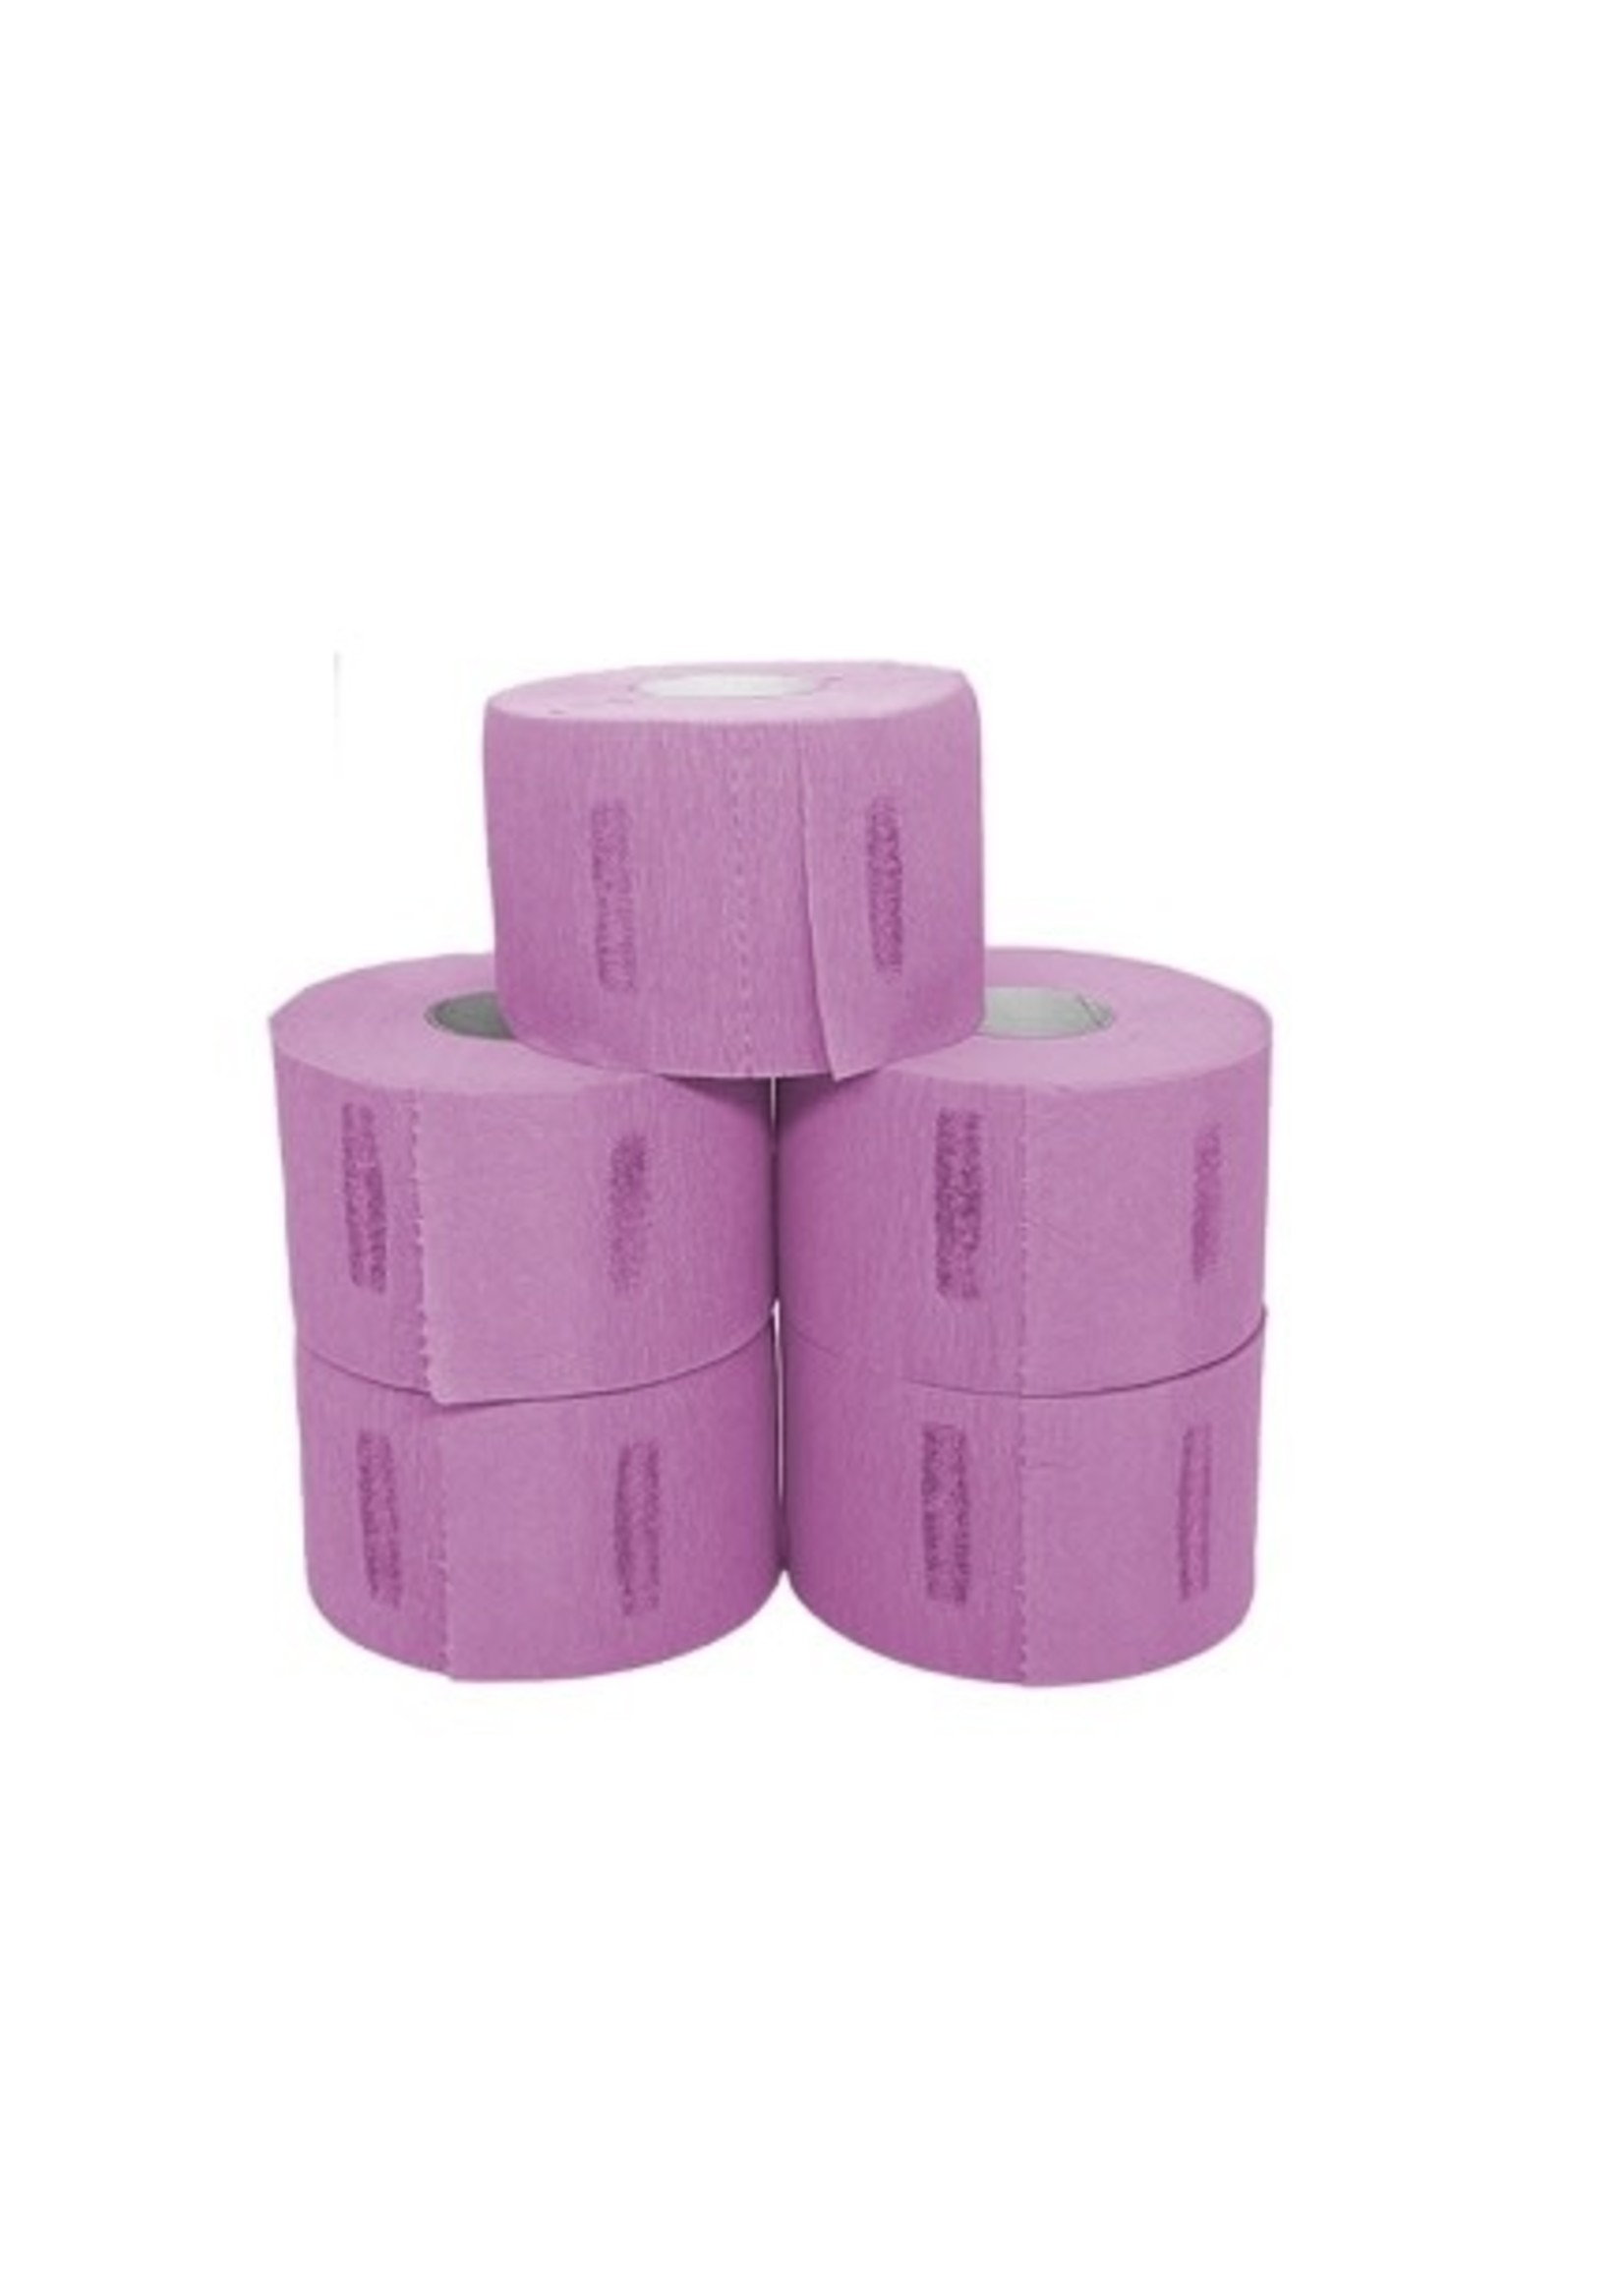 Level 3 L3-5 Rolls Neck Strips- Pink